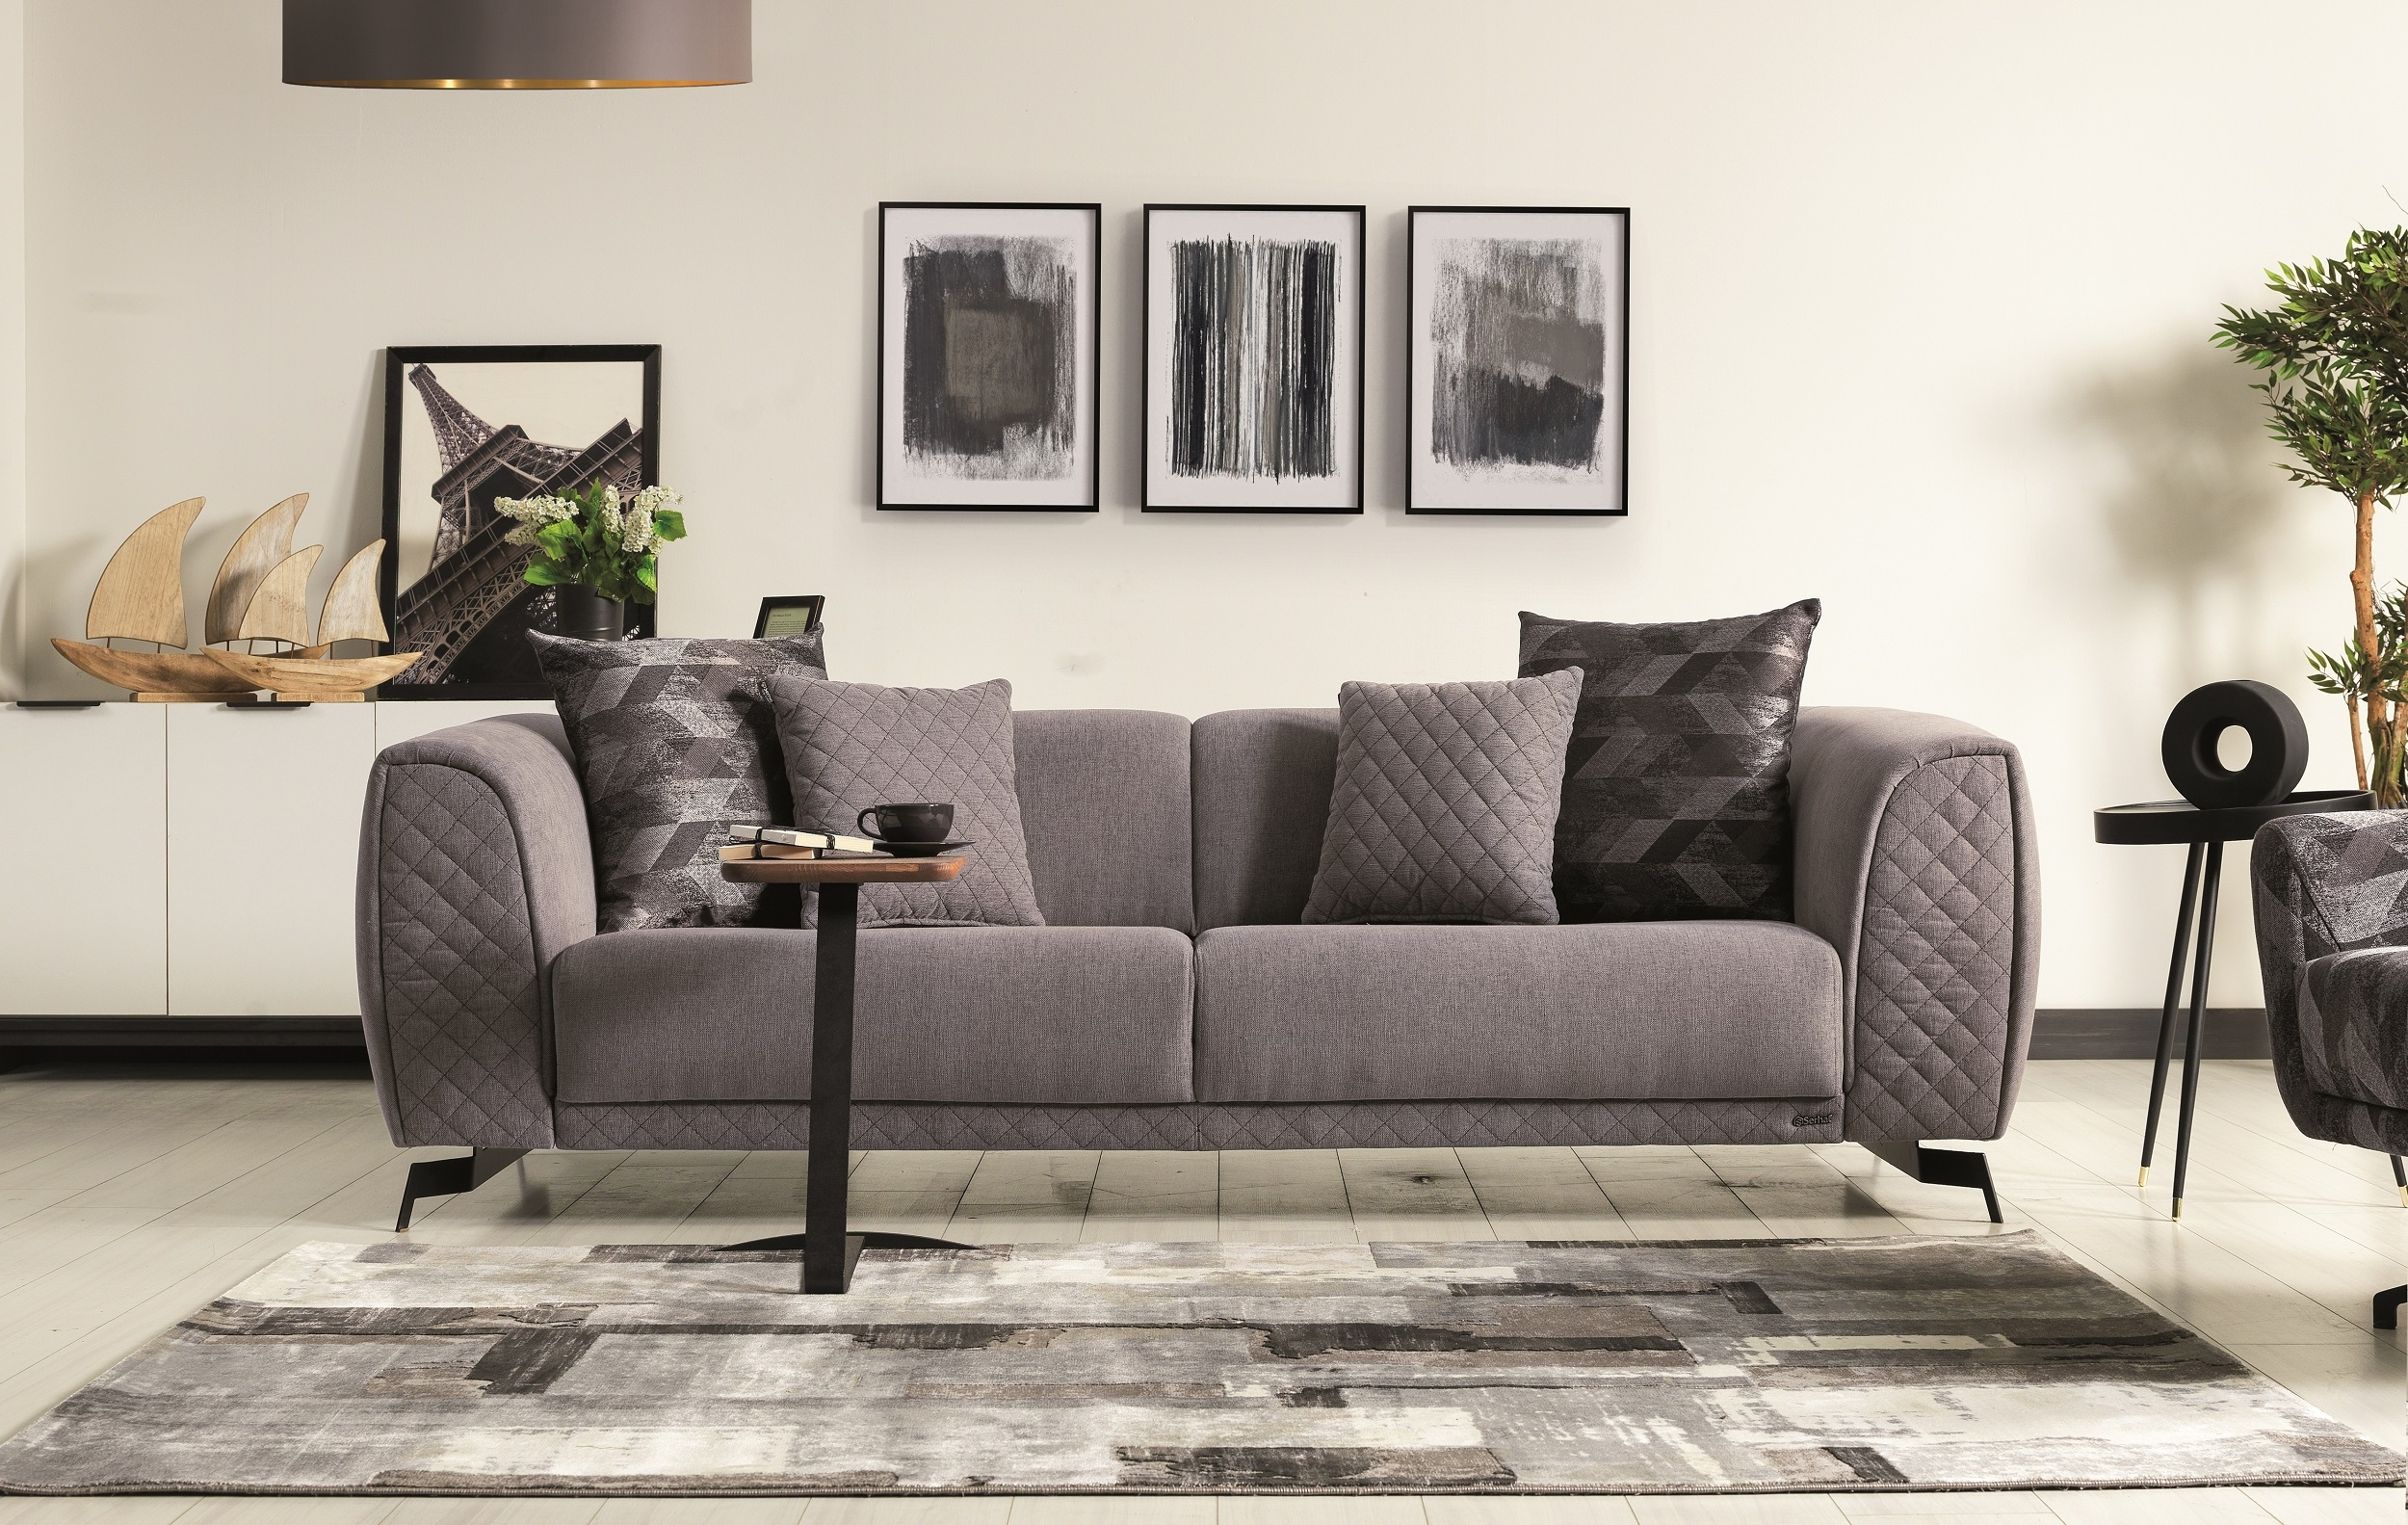 Canapea tapitata cu stofa, 3 locuri, cu functie sleep pentru 1 persoana Platin Gri K1, l238xA100xH72 cm somproduct.ro imagine 2021